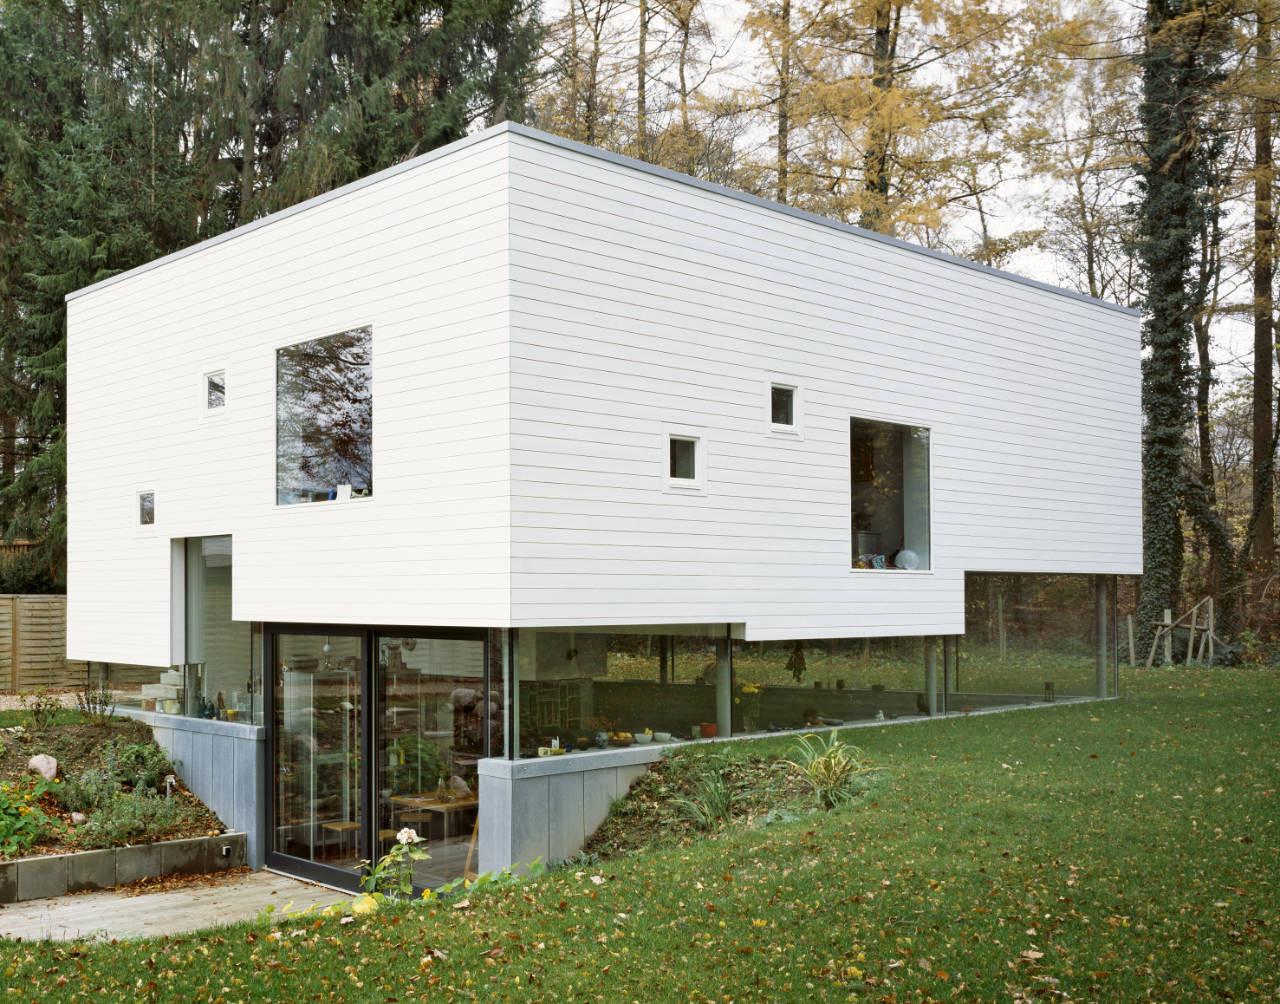 Haws W / Kraus Schoenberg Architects, © Ioana Marinescu